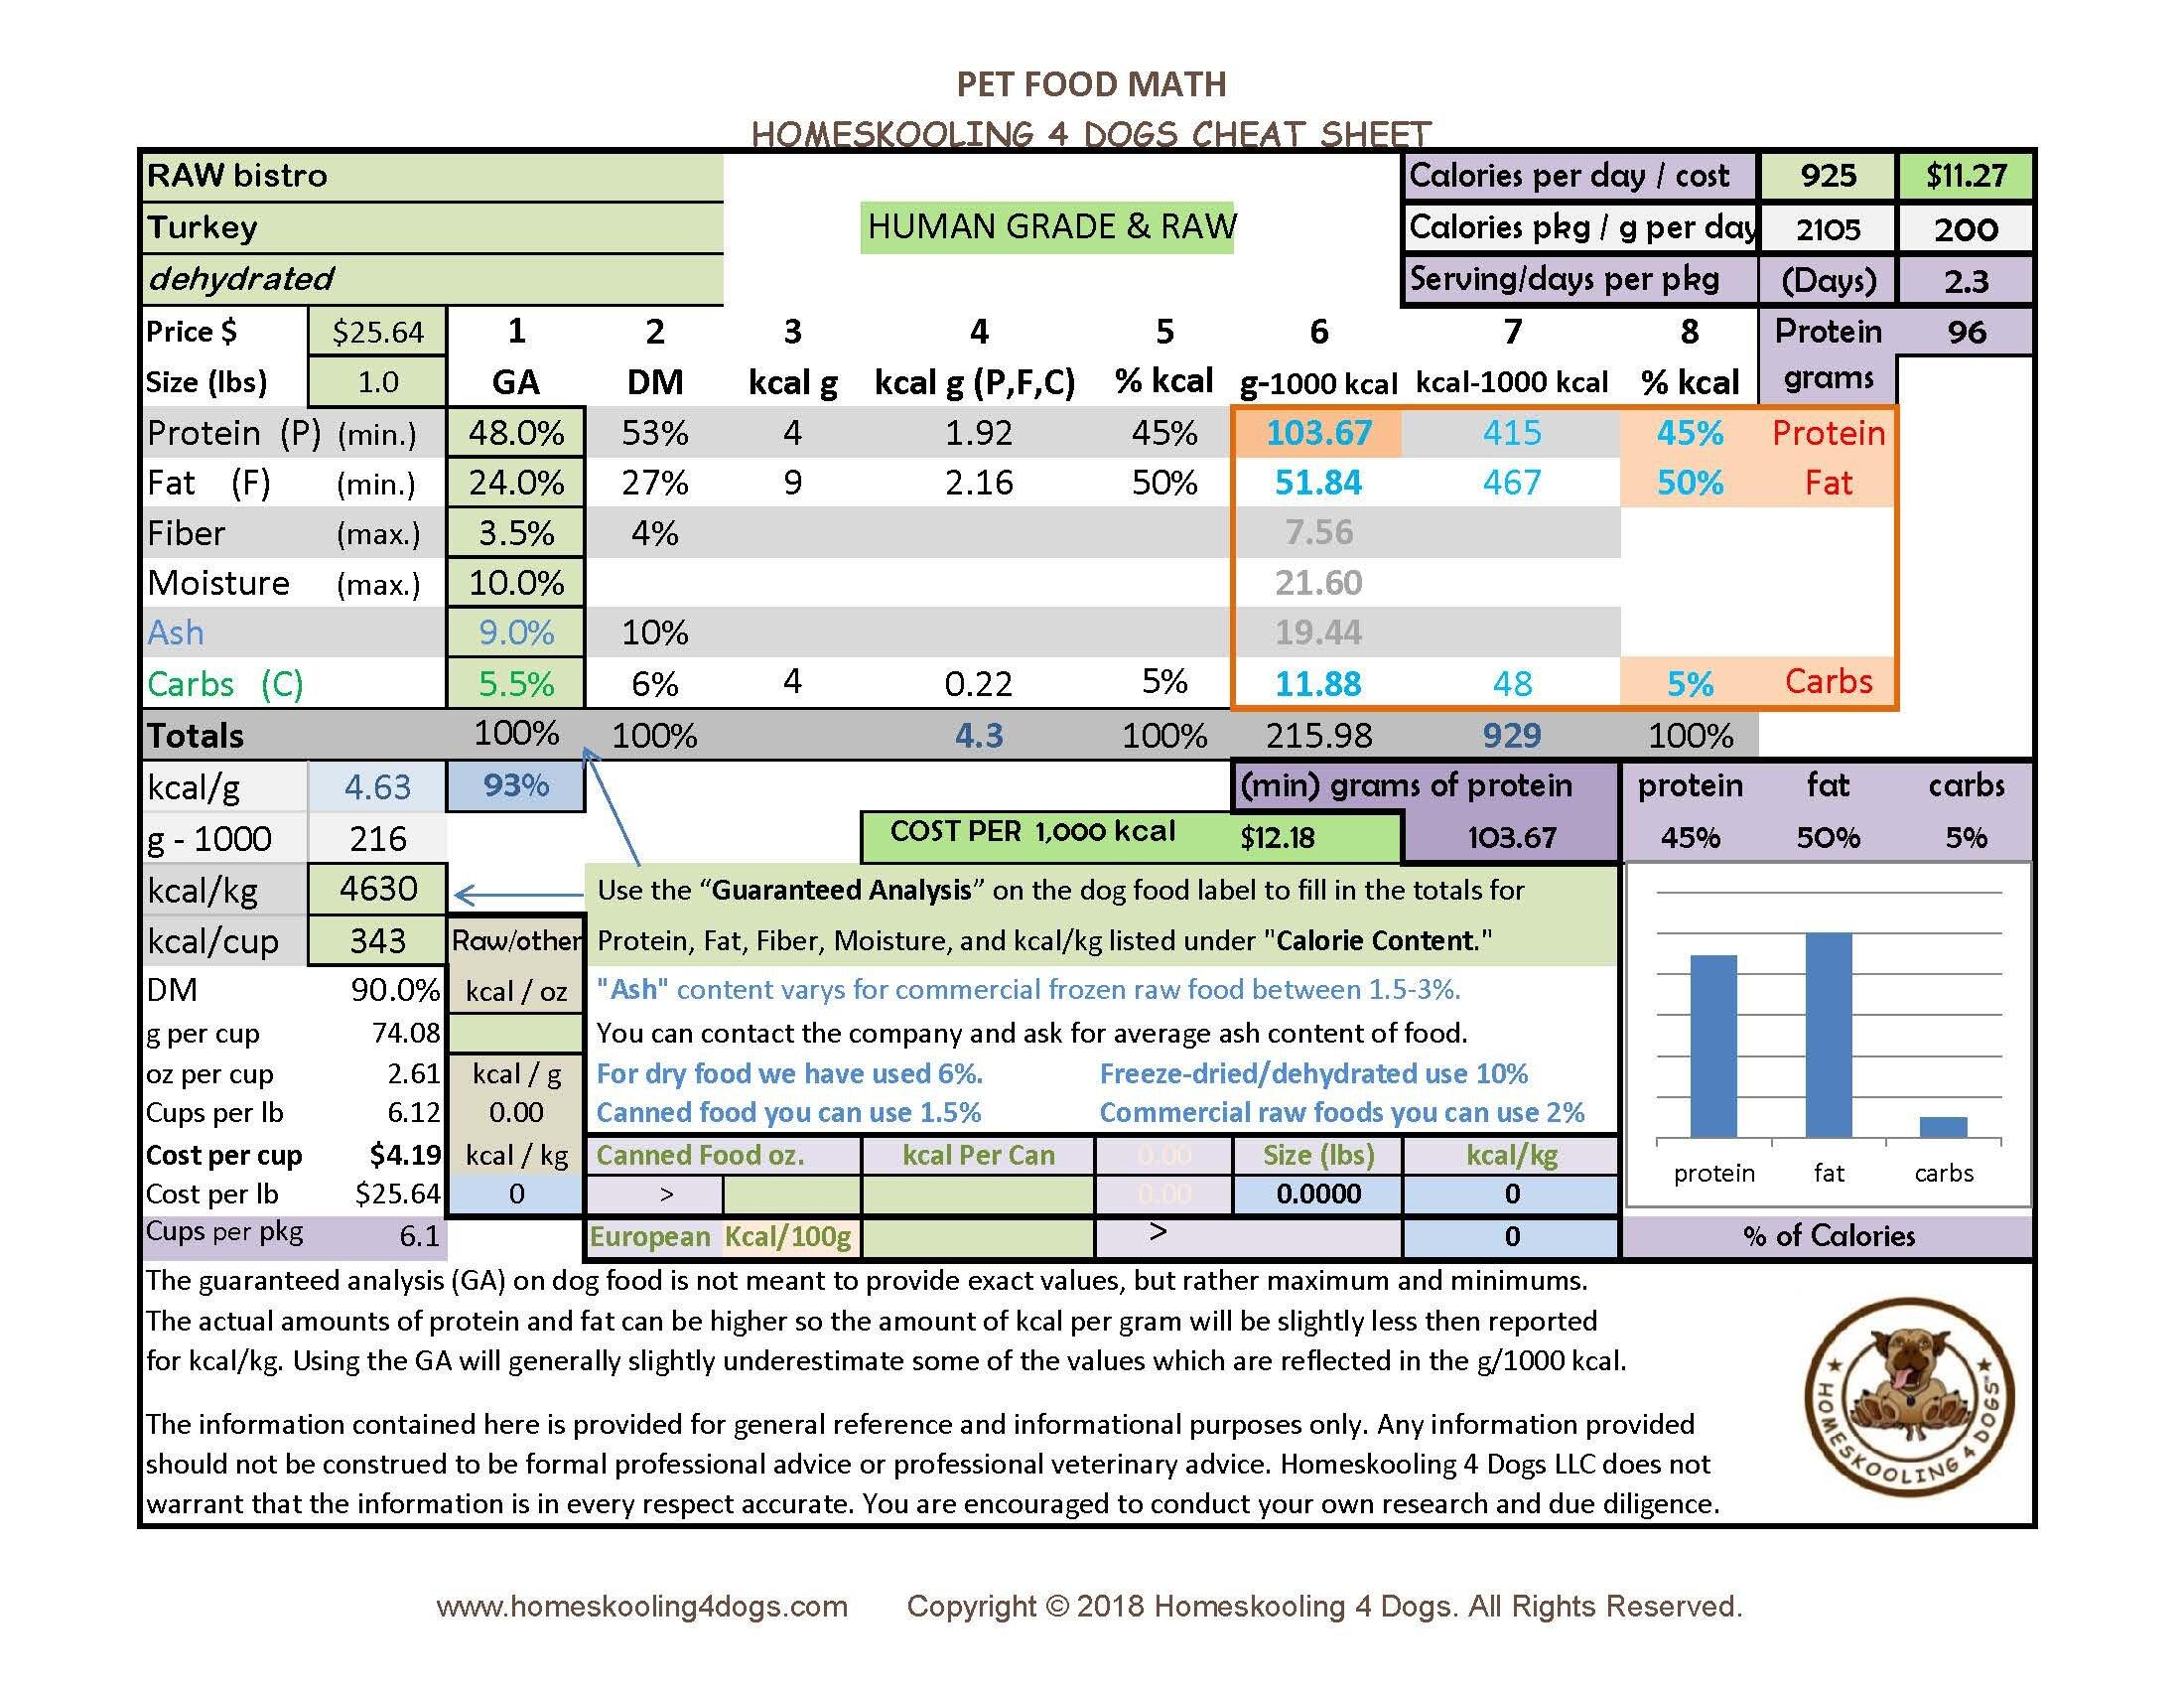 RAW bistro turkey dehydrated Pet Food Math Cheat Sheet update.jpg